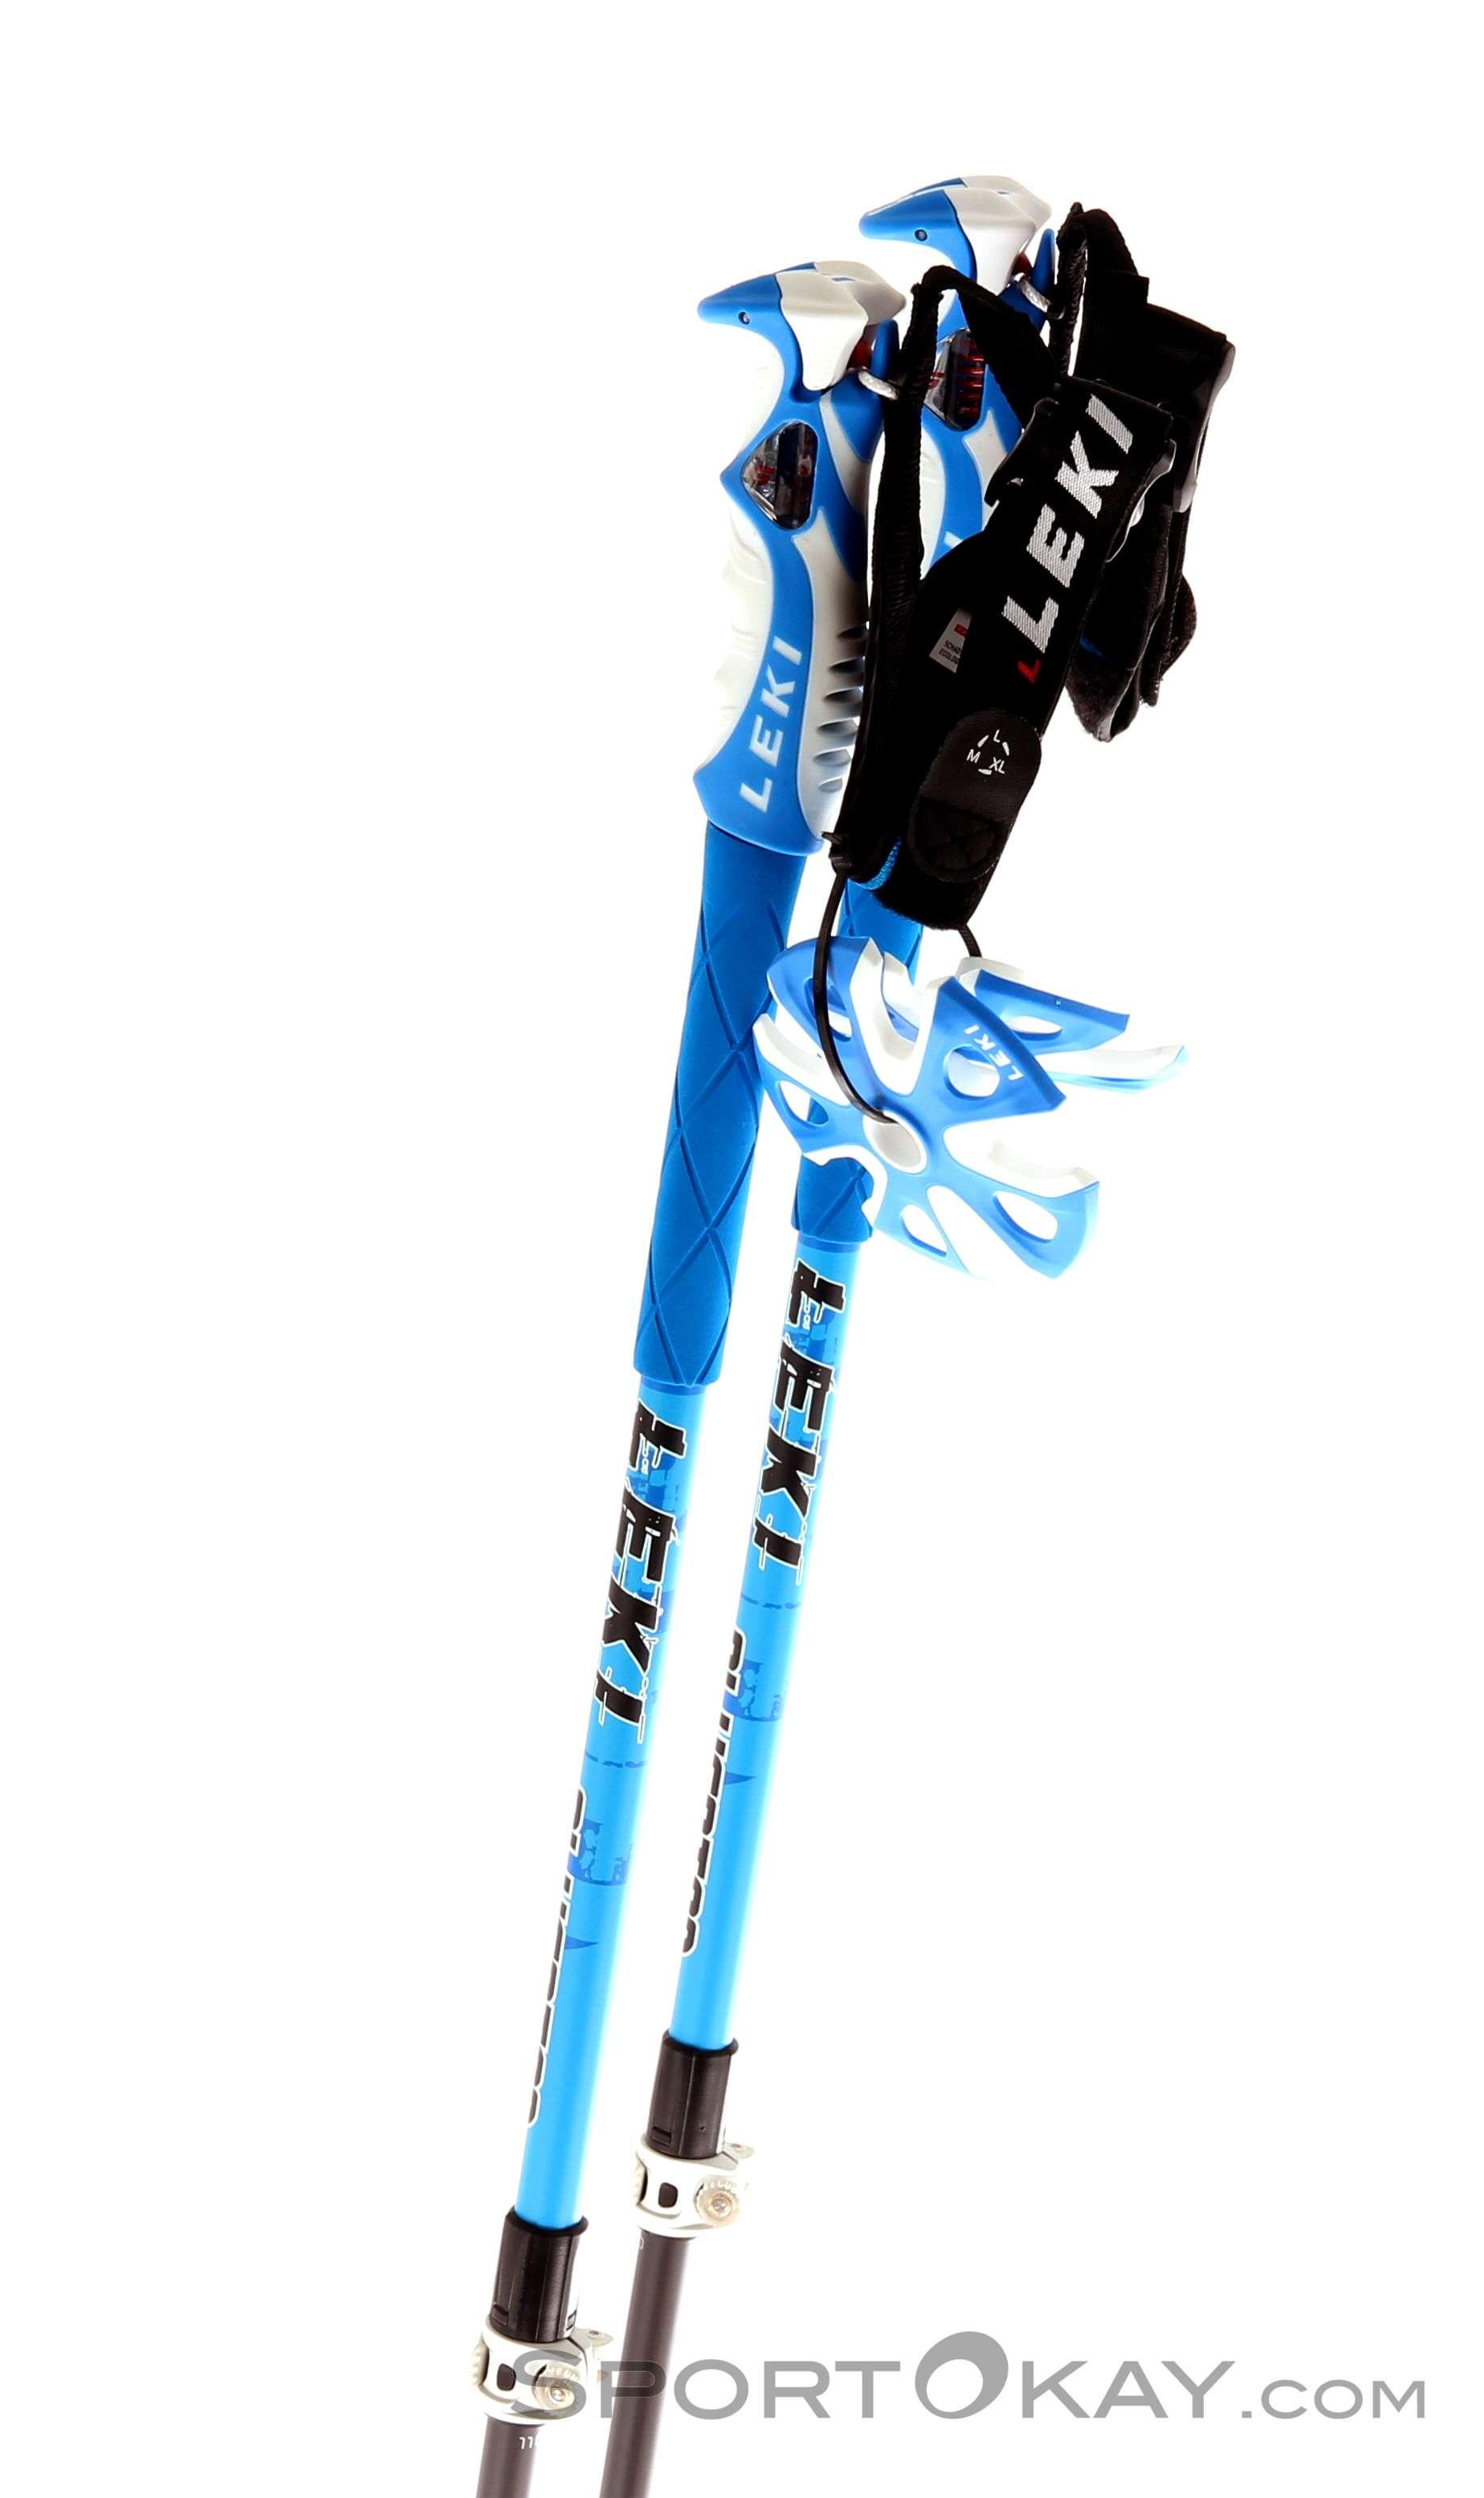 0f90ceabbd3 Leki Blue Bird Vario Freeride Ski Poles - Telescopic Poles 2 Pcs ...